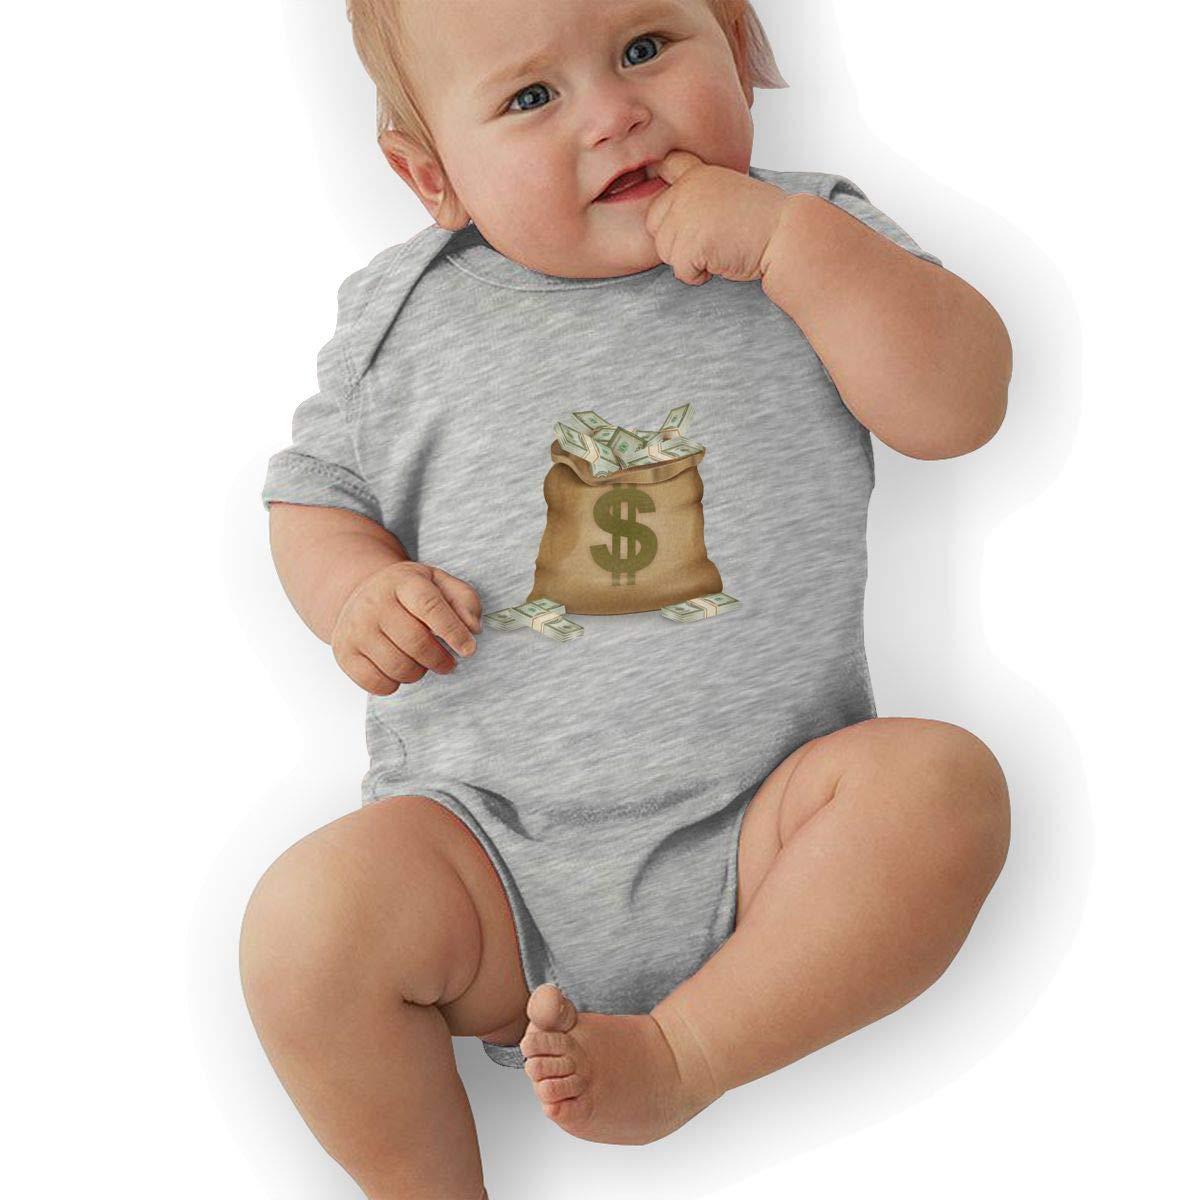 biernsege Newborn Baby Boys Bodysuit Short-Sleeve Onesie A Bag of Dollars Print Outfit Winter Pajamas